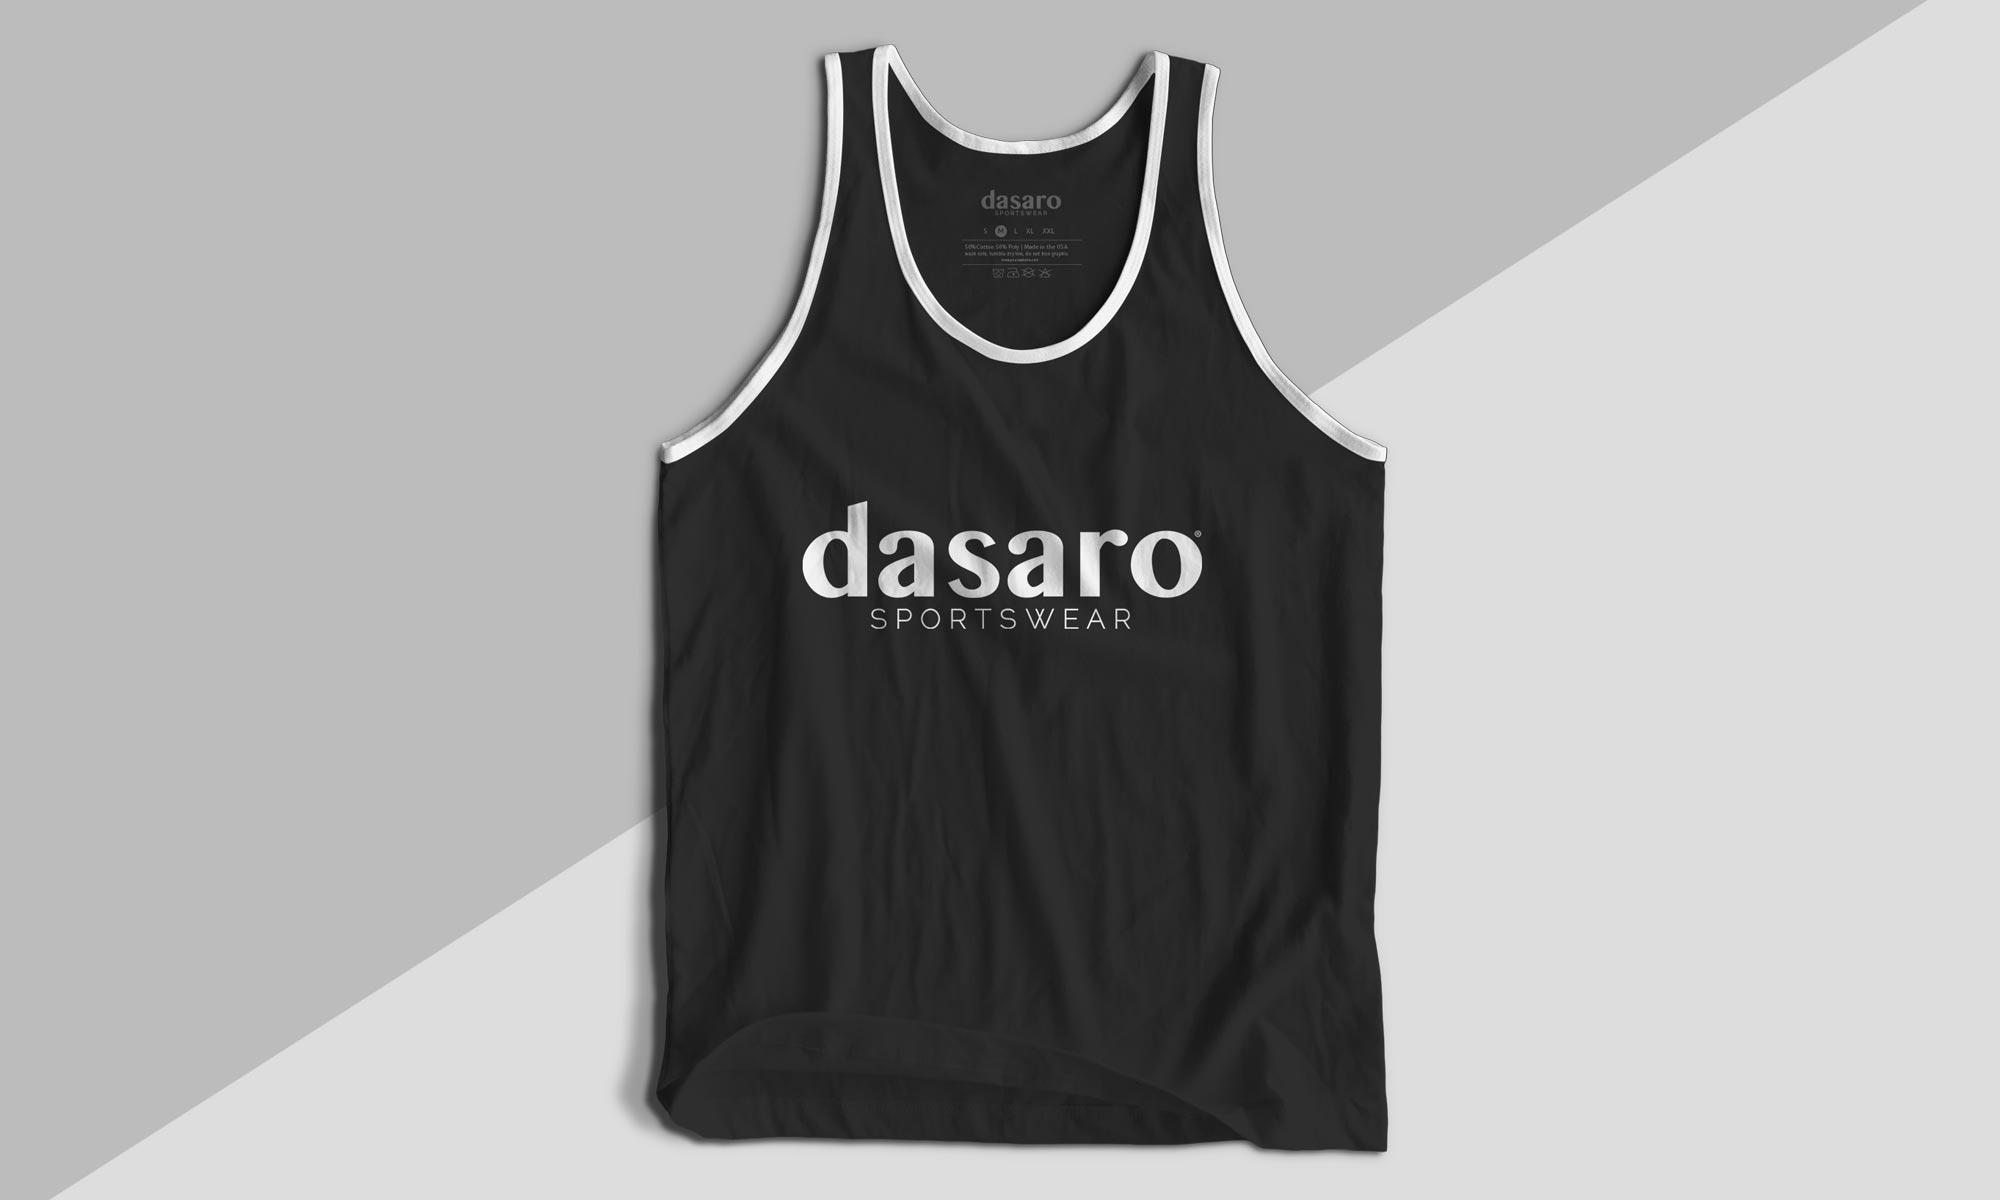 https://www.atelierzoz.com/wp-content/uploads/2020/03/works_dasaro-4.jpg